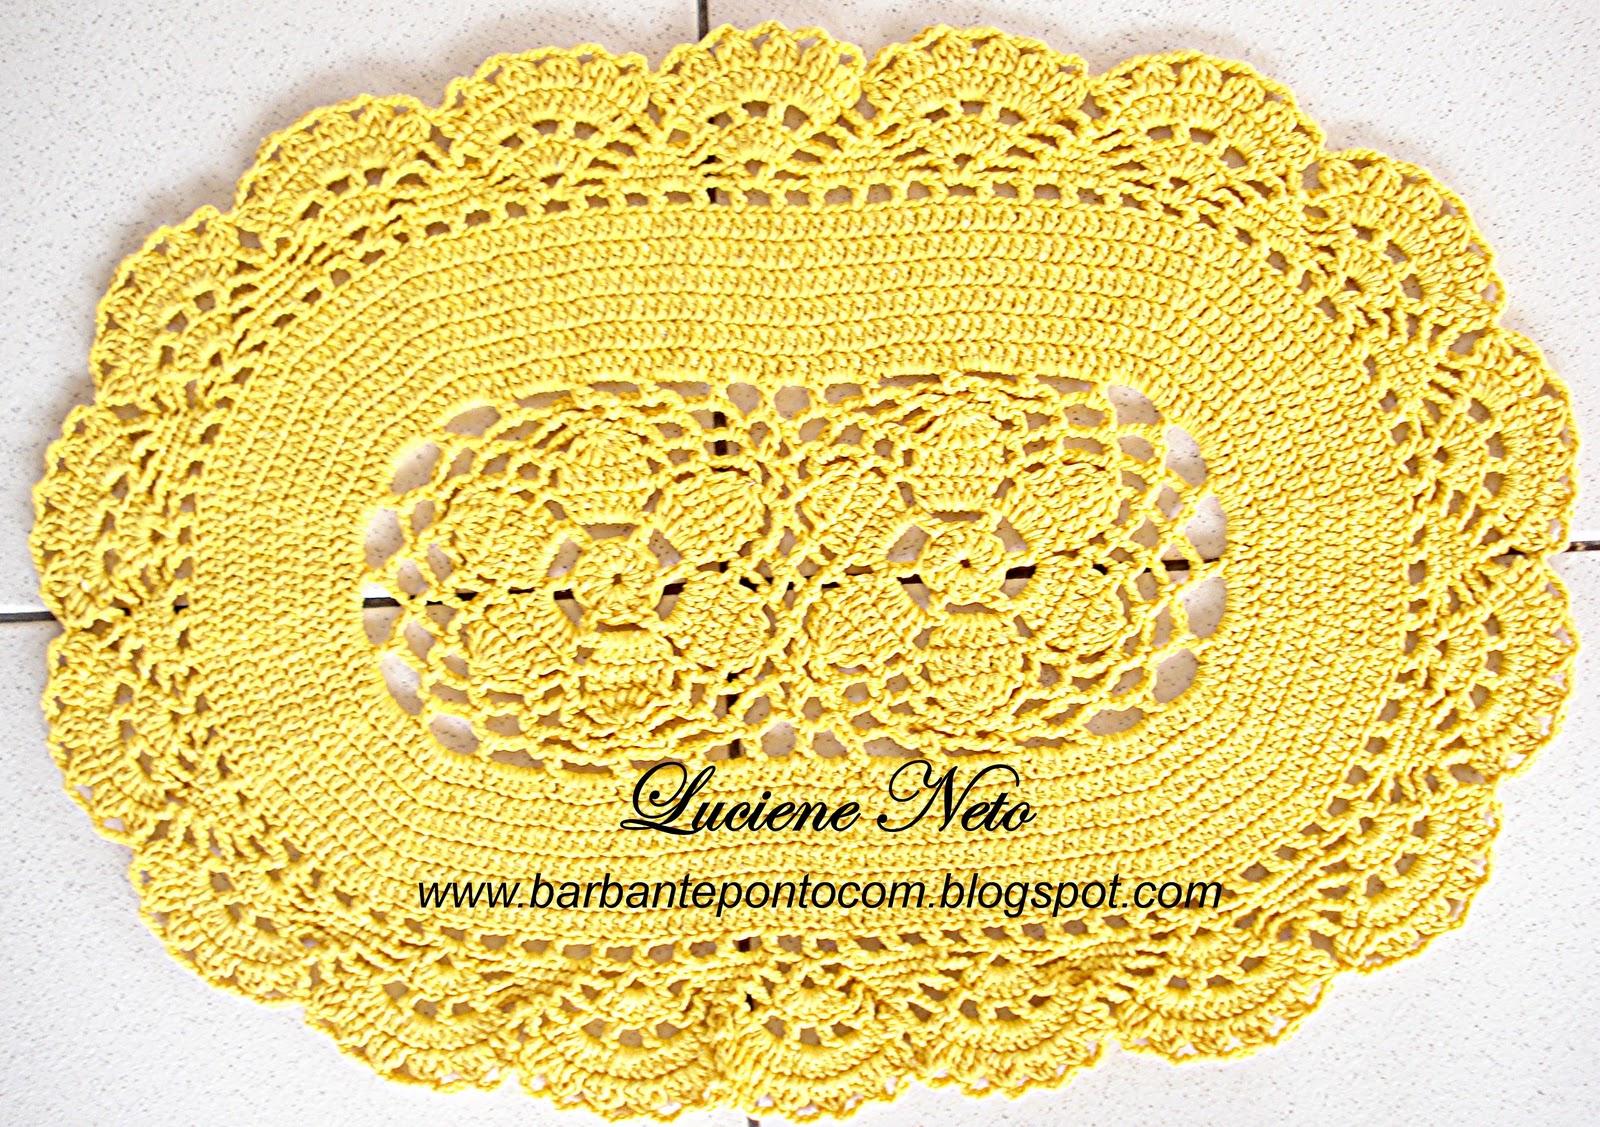 Tapete Oval Amarelo Barbante Pioneiro barbantepontocom #BBA610 1600 1127